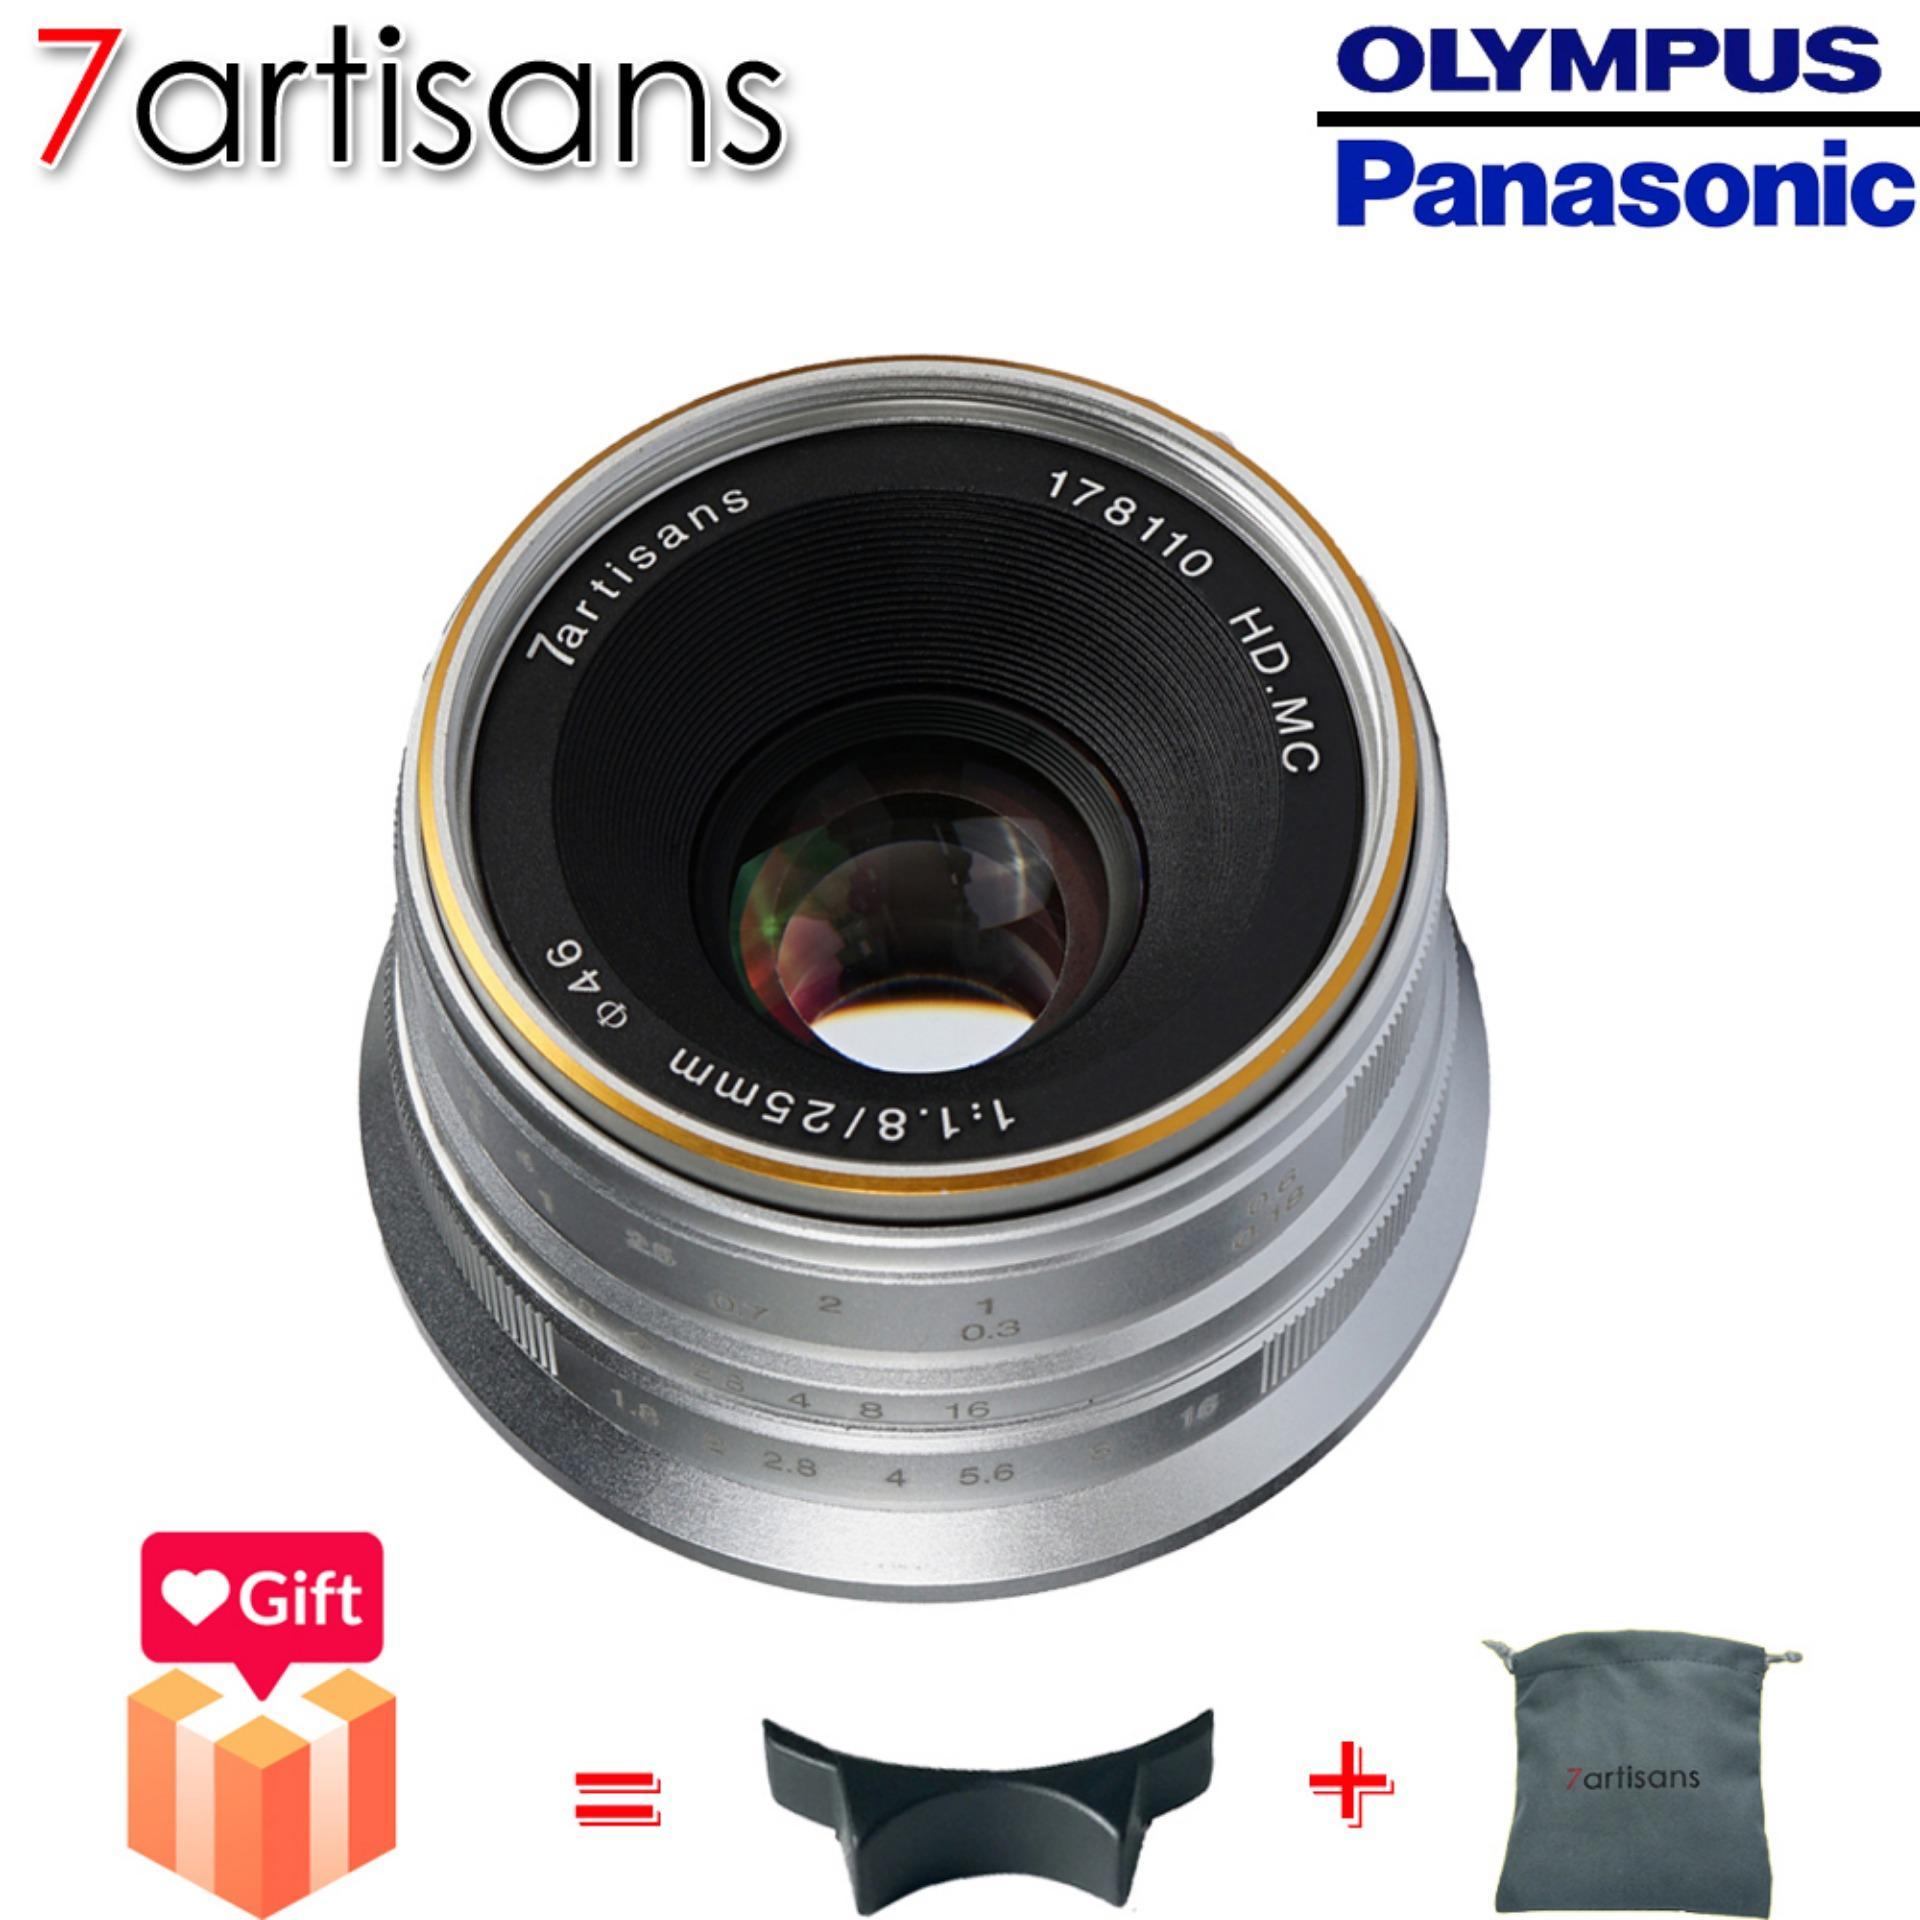 7artisans 25mm F1.8 Manual Lensa Tetap untuk M4/3 Gunung Kamera Panasonic G1 G2 G3 G4 G5 G6 G7 GF1 GF2 GF3 GF5 GF6 GM1 Olympus E-PM1 E-PM2 E-PL1 E-PL2 E-PL3 E-PL5 (Hitam/Perak)